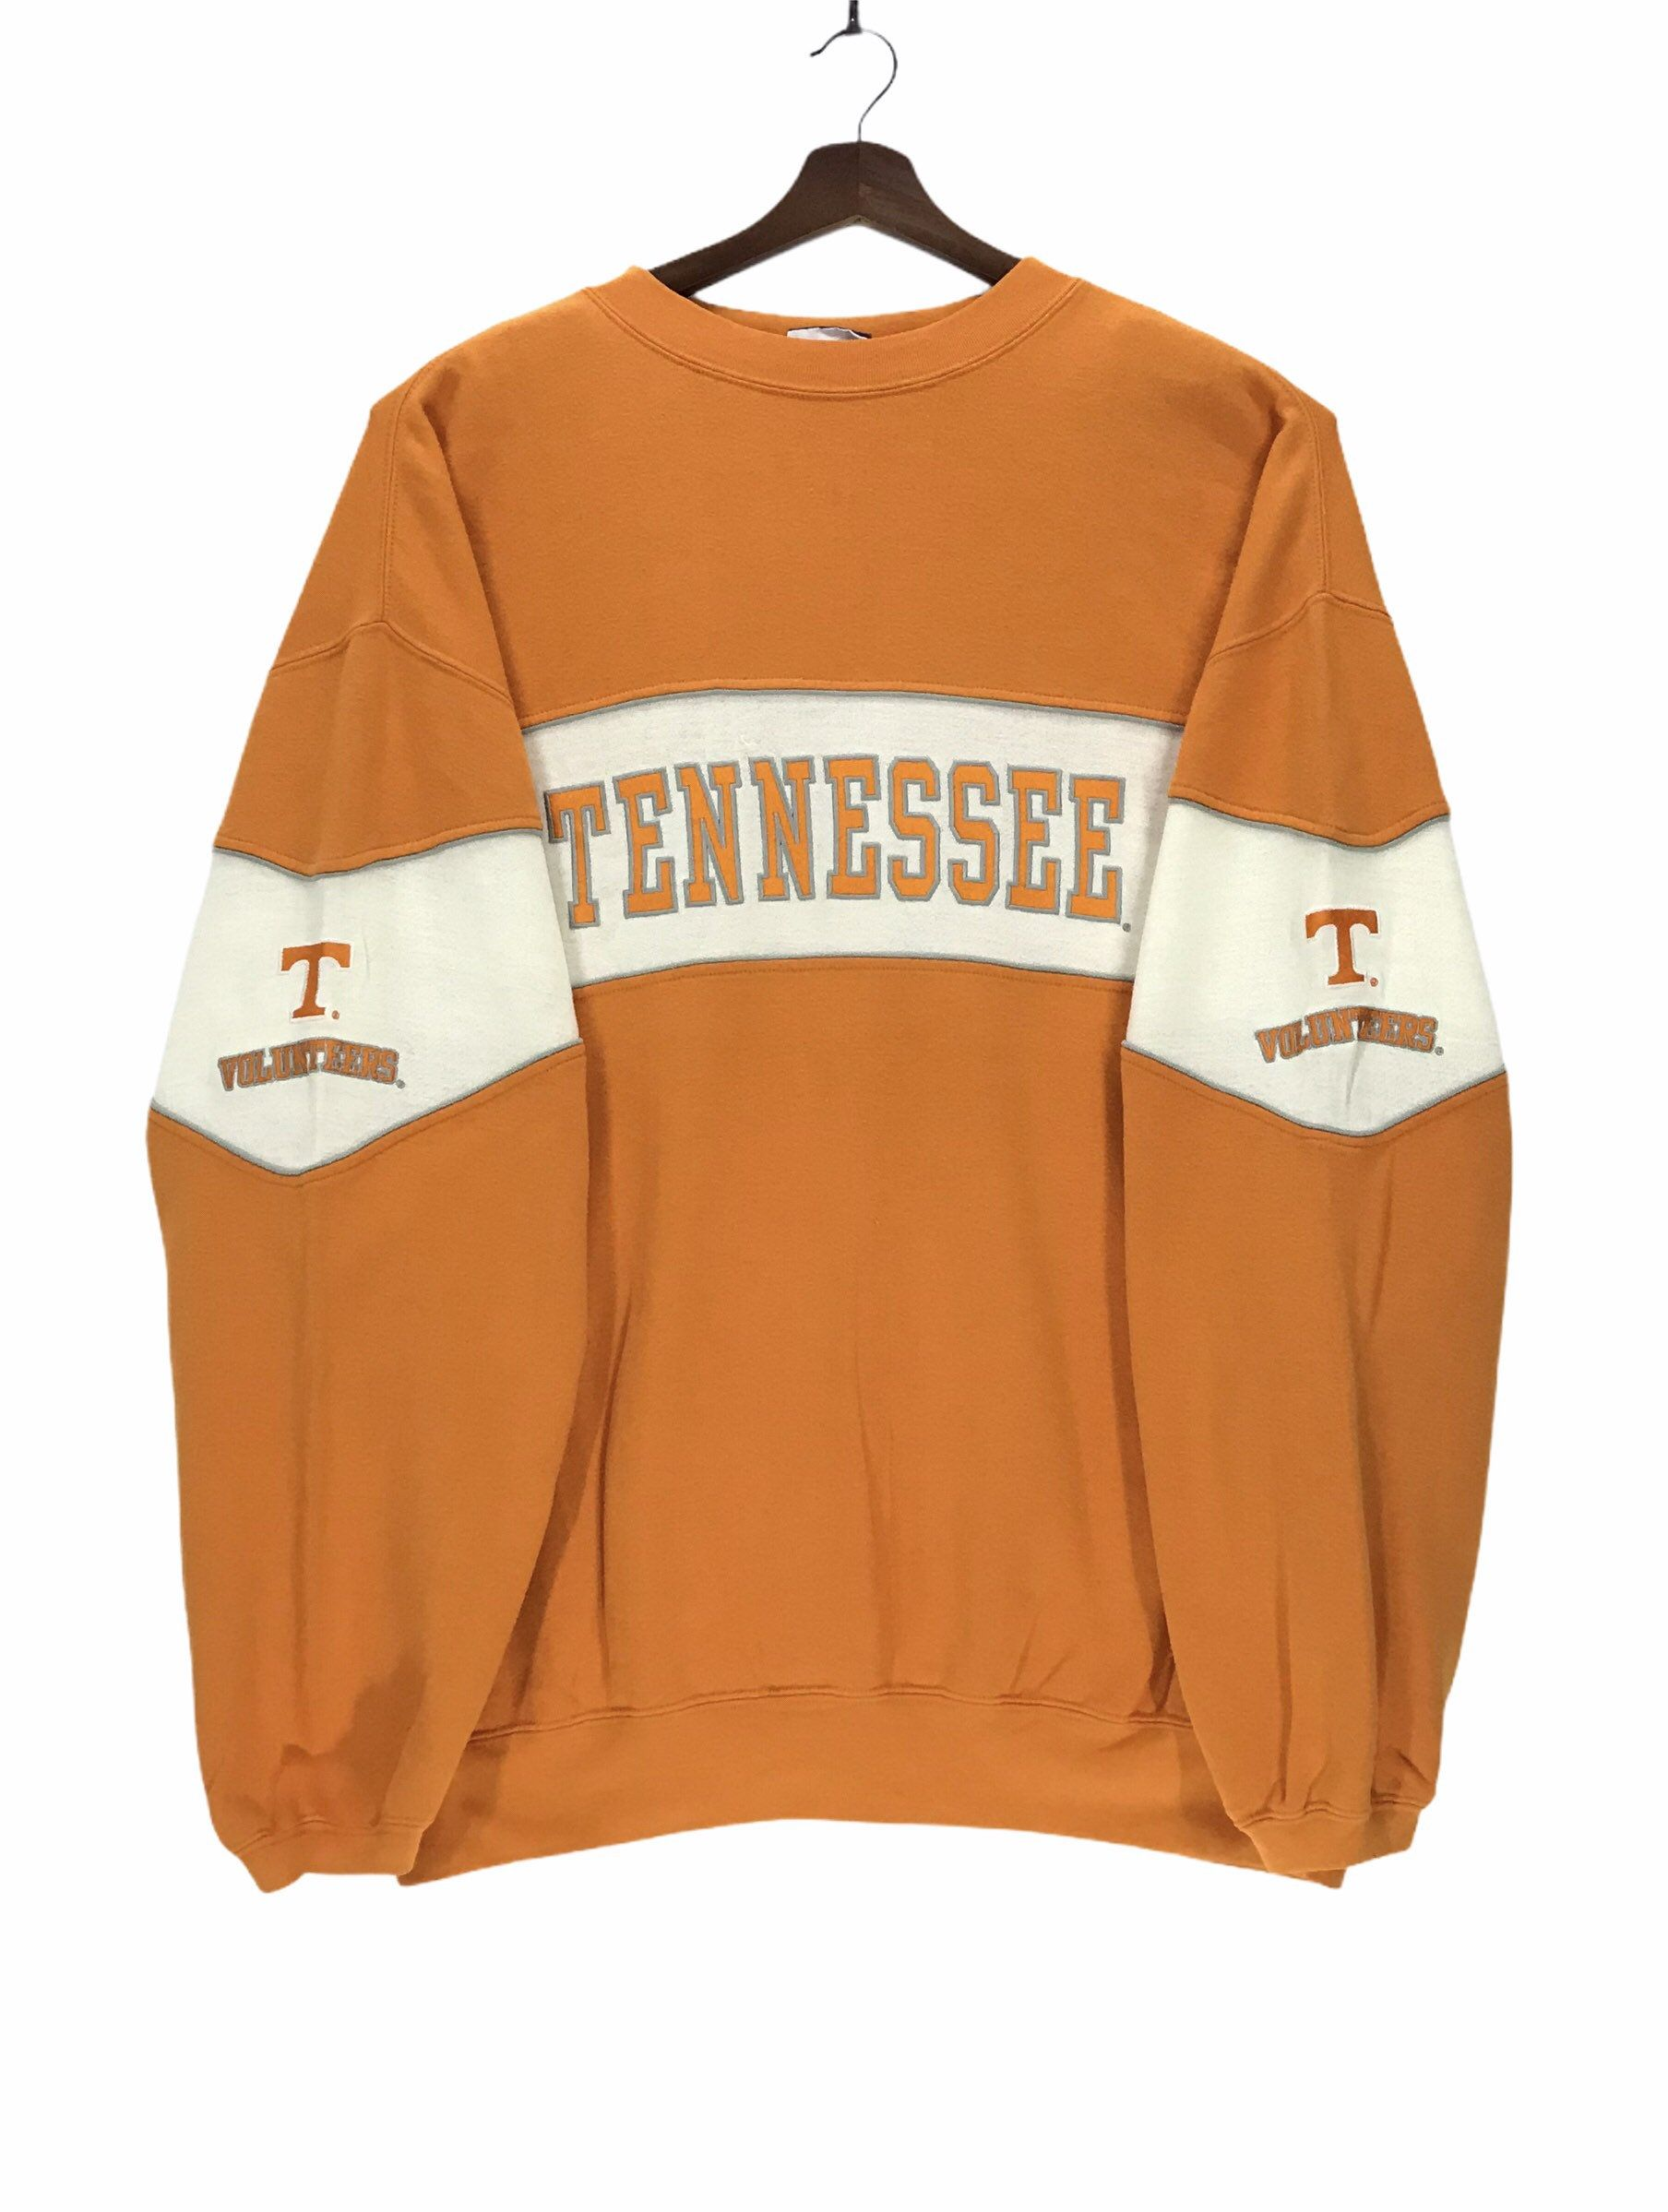 Vintage University Of Tennessee Tsu Sweatshirt Crewneck Etsy In 2021 Vintage College Sweatshirts Vintage Sweatshirt Sweatshirts [ 2398 x 1808 Pixel ]